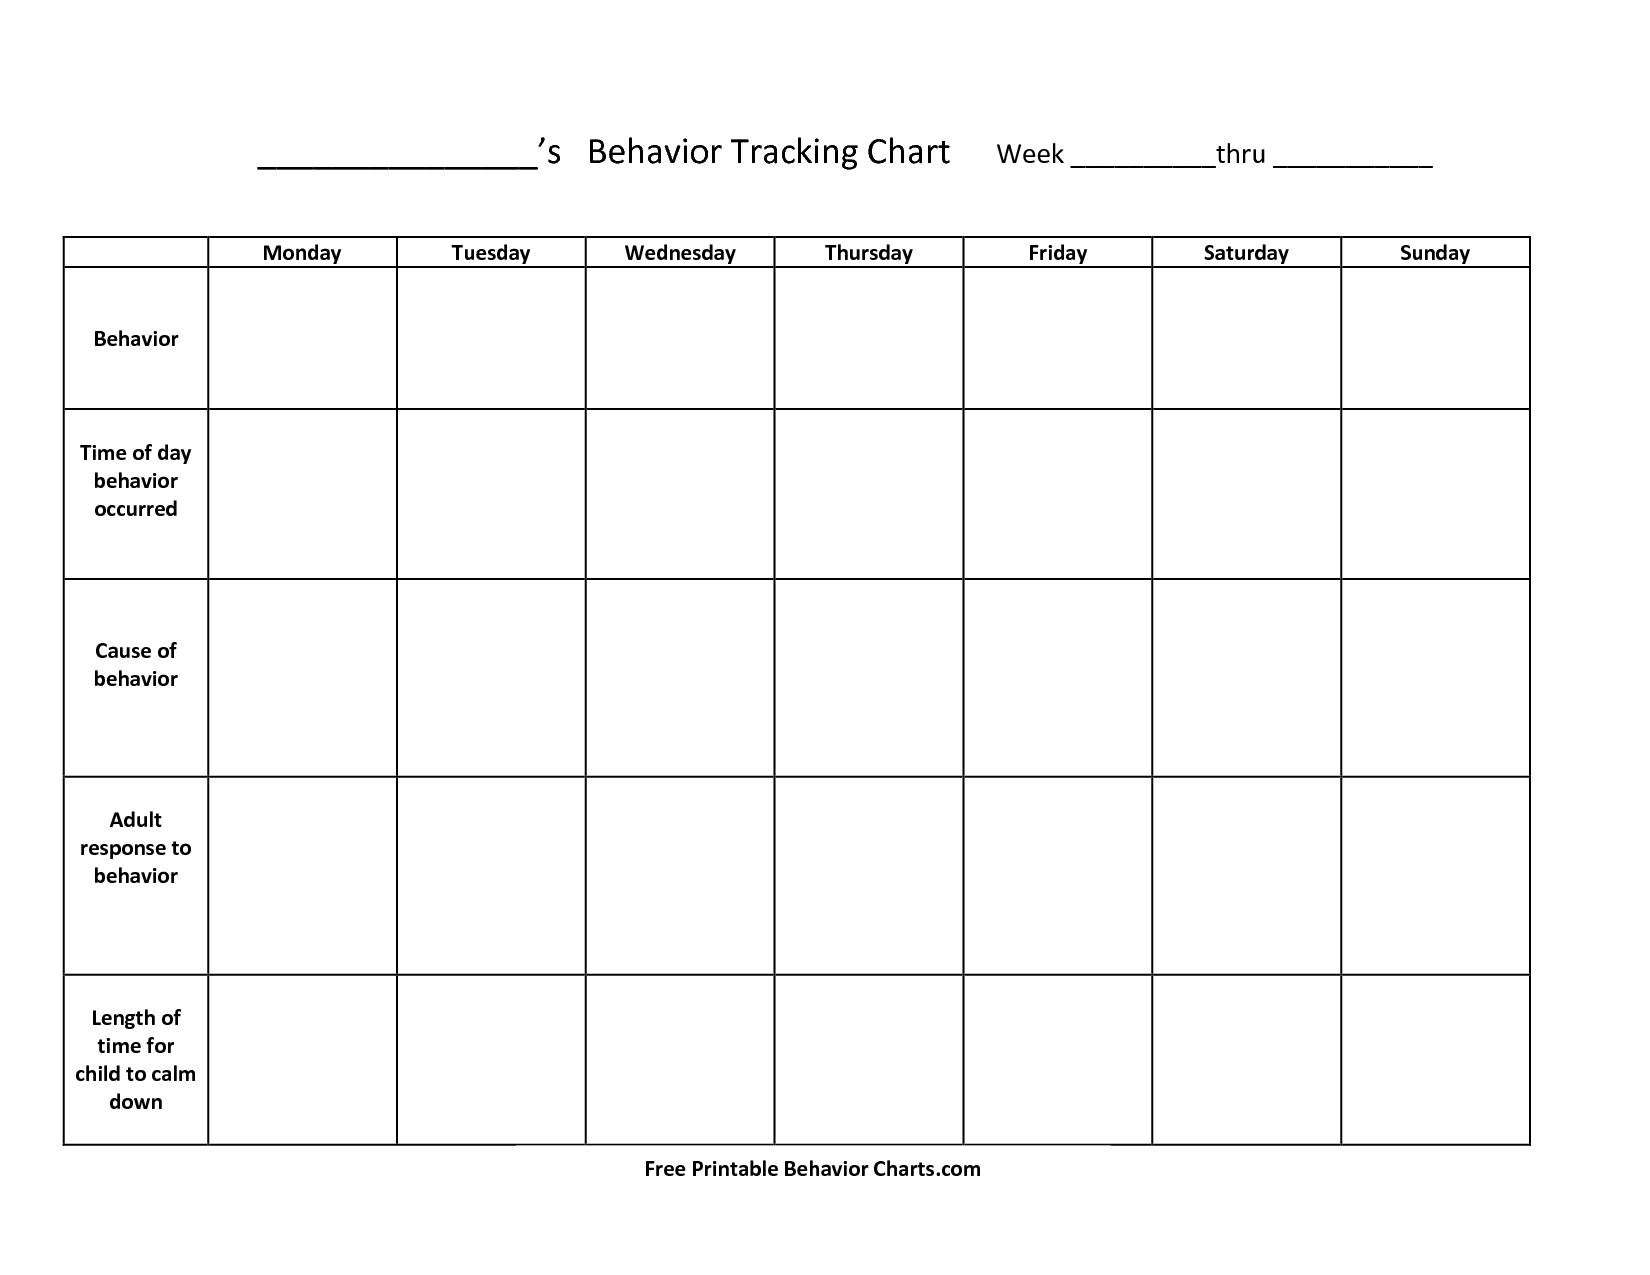 ... Teachers and Free Printable Behavior Chart Templates / printablee.com